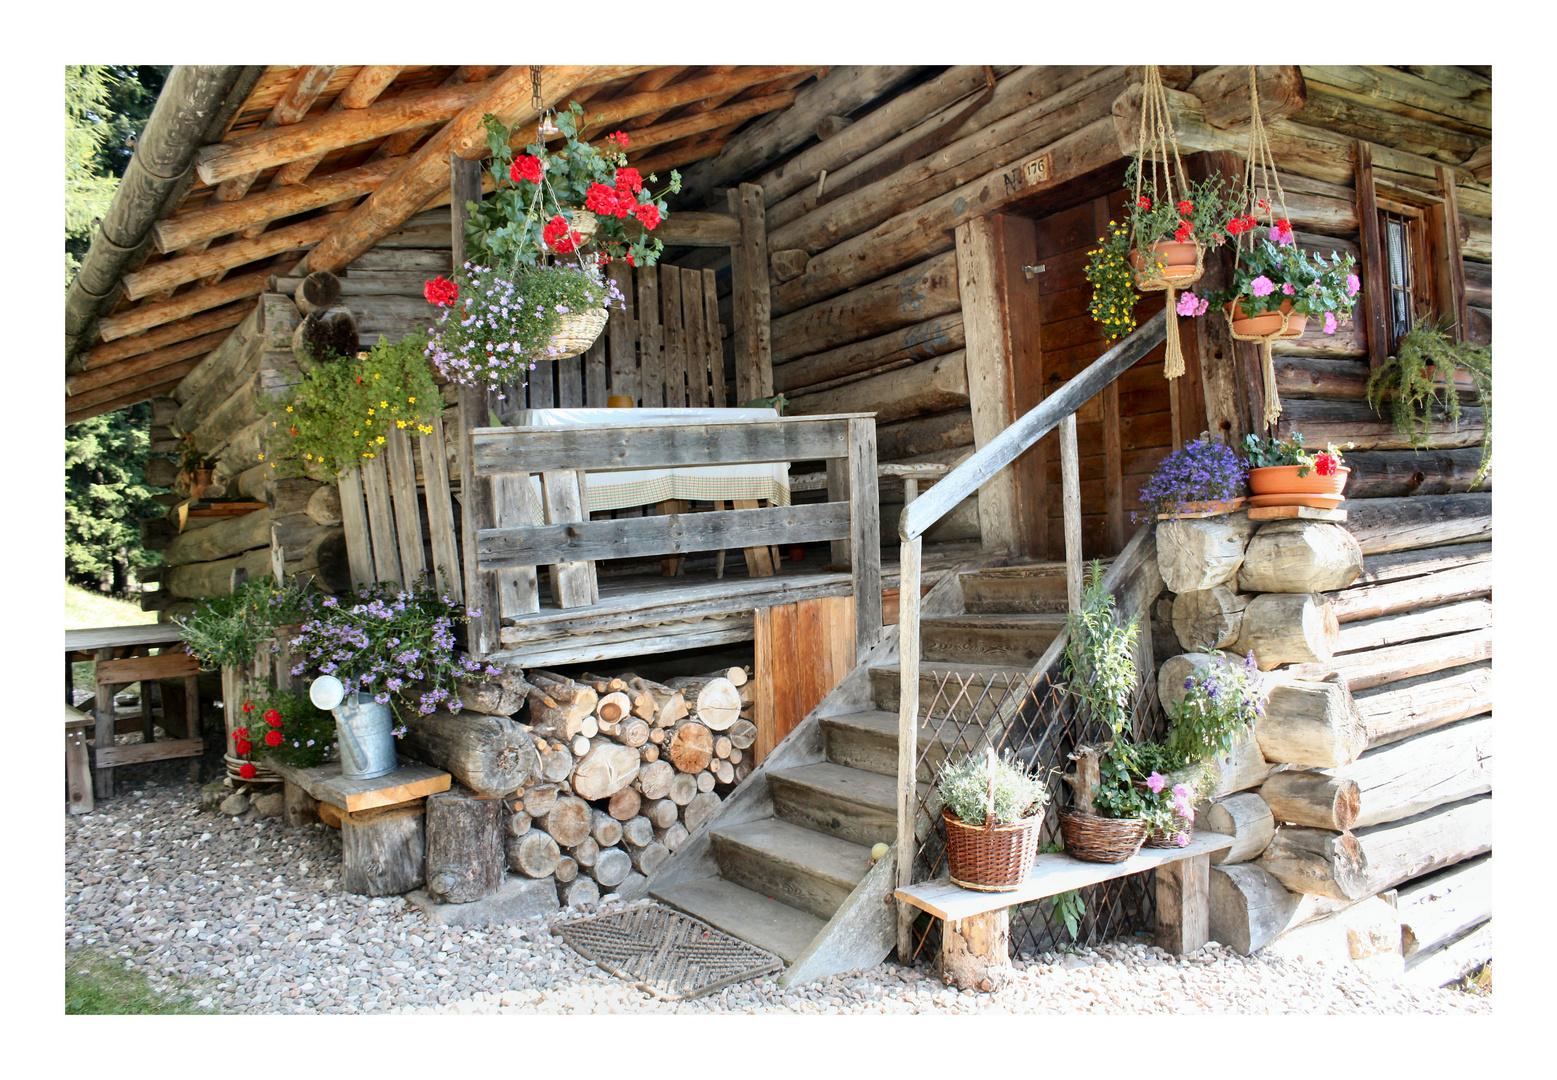 Hüttenromantik